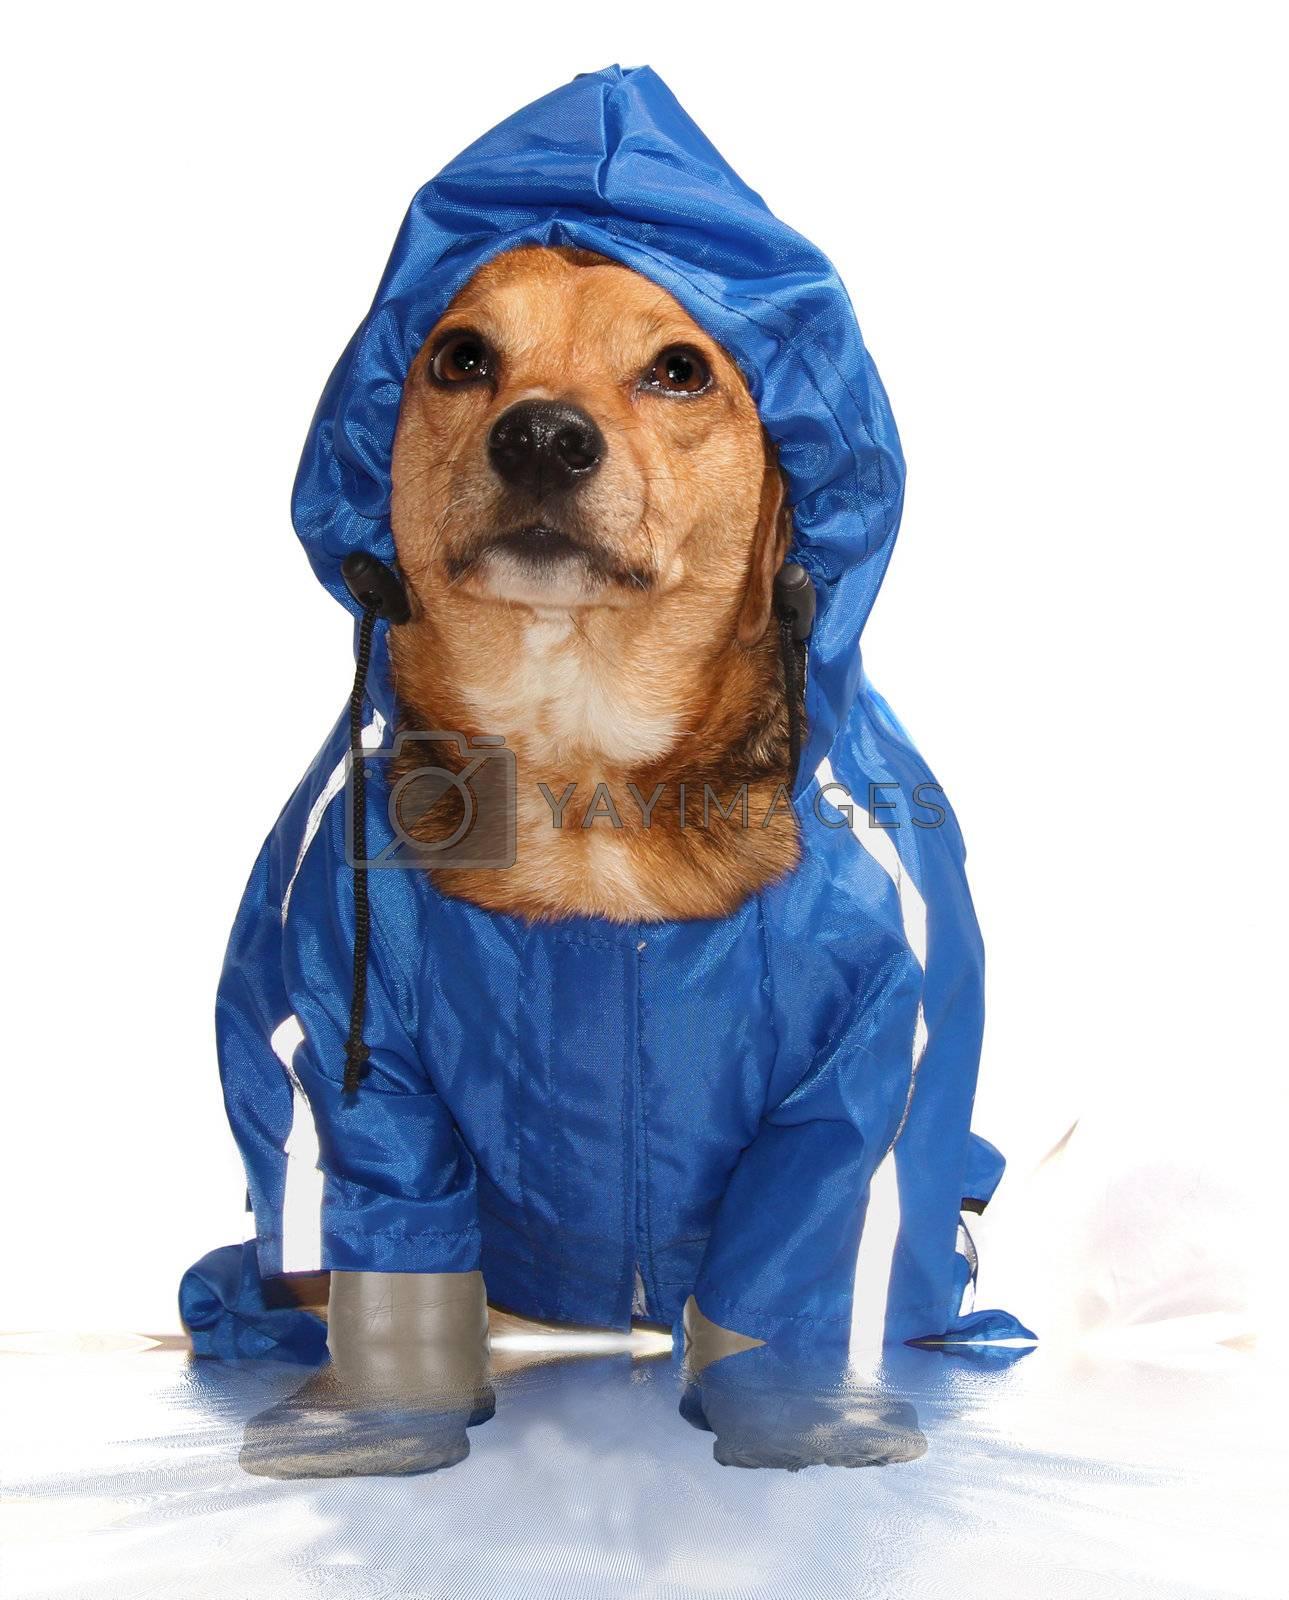 the blue rain dog in the bathroom